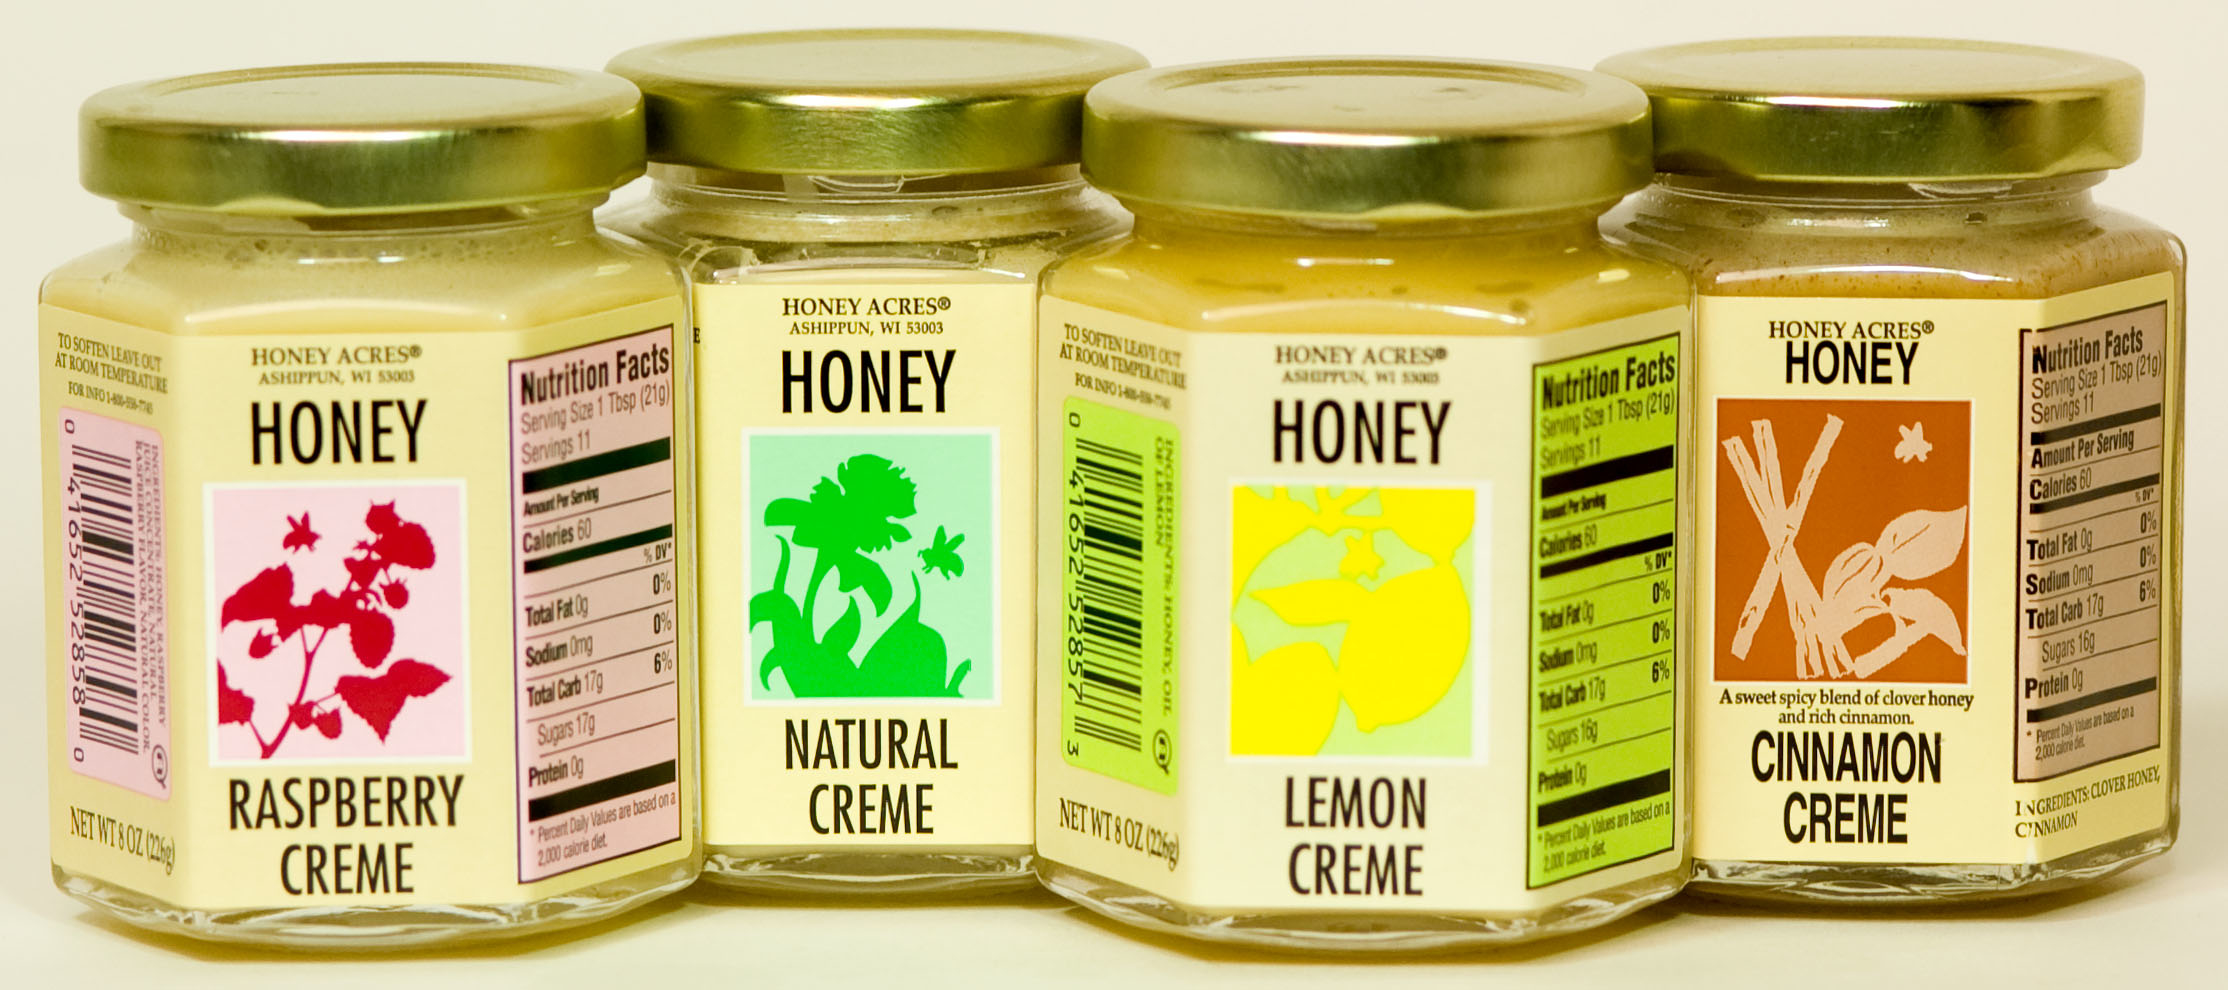 Honey Acres Inc image 3